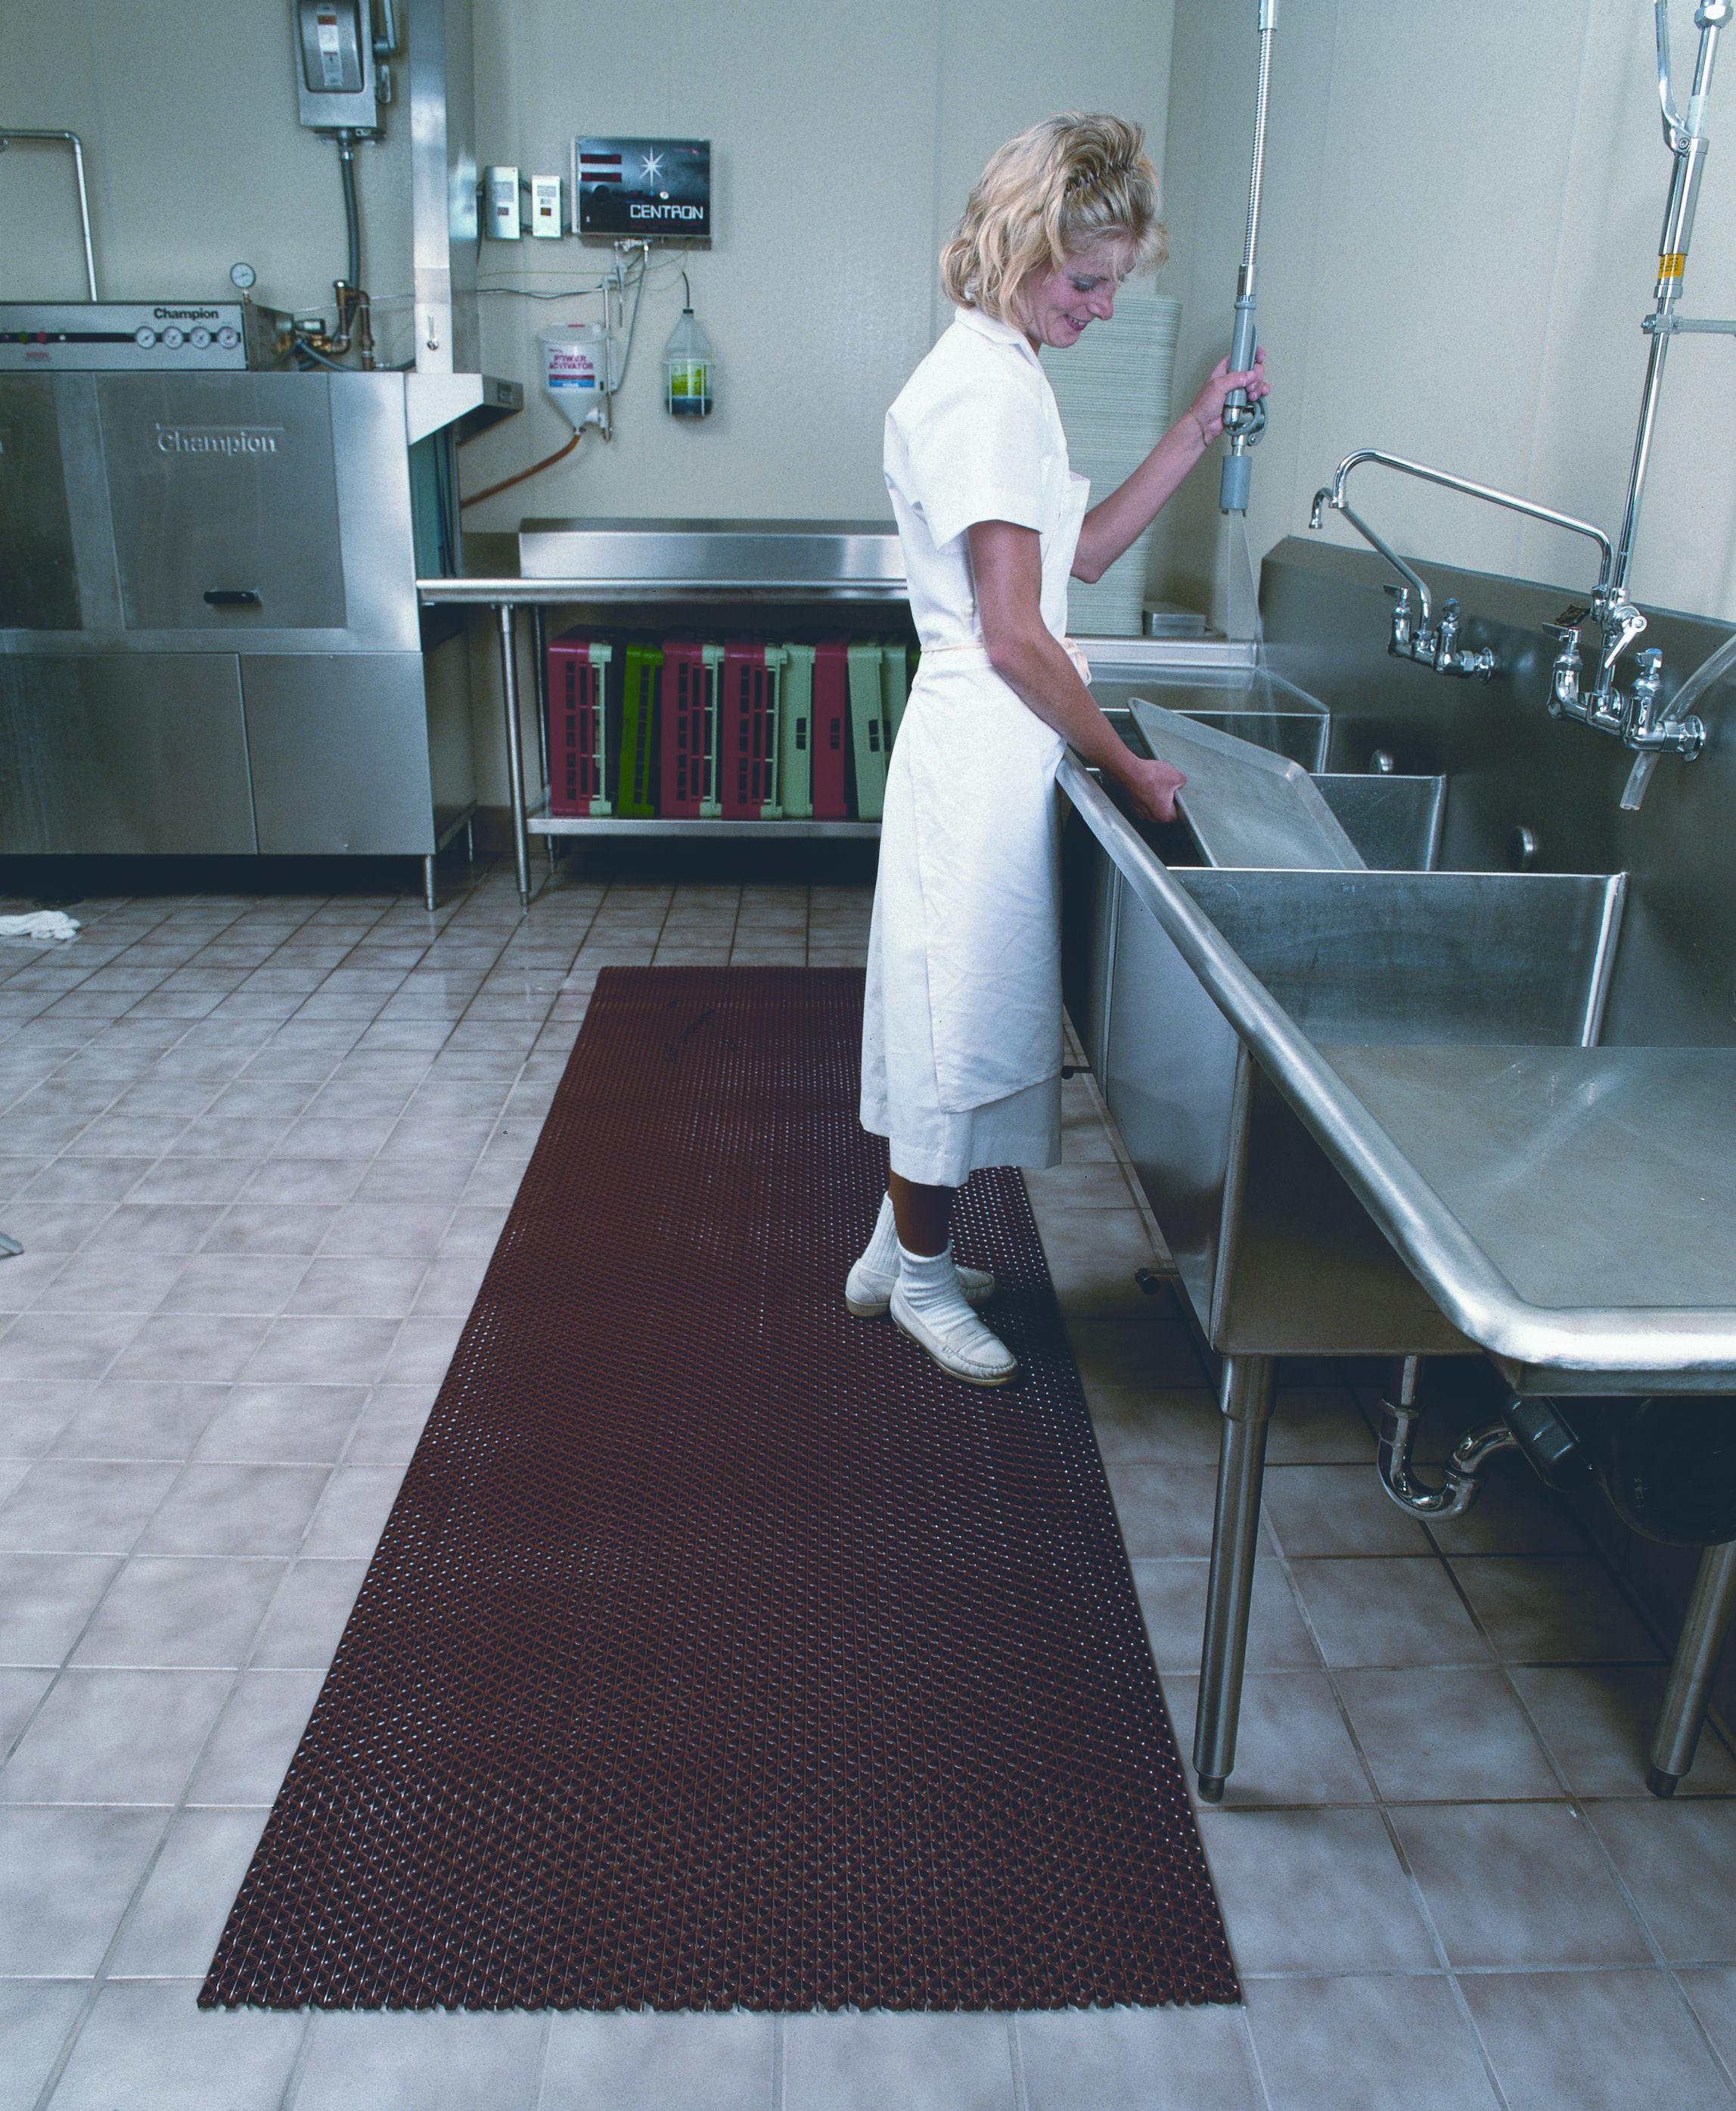 Relief mat